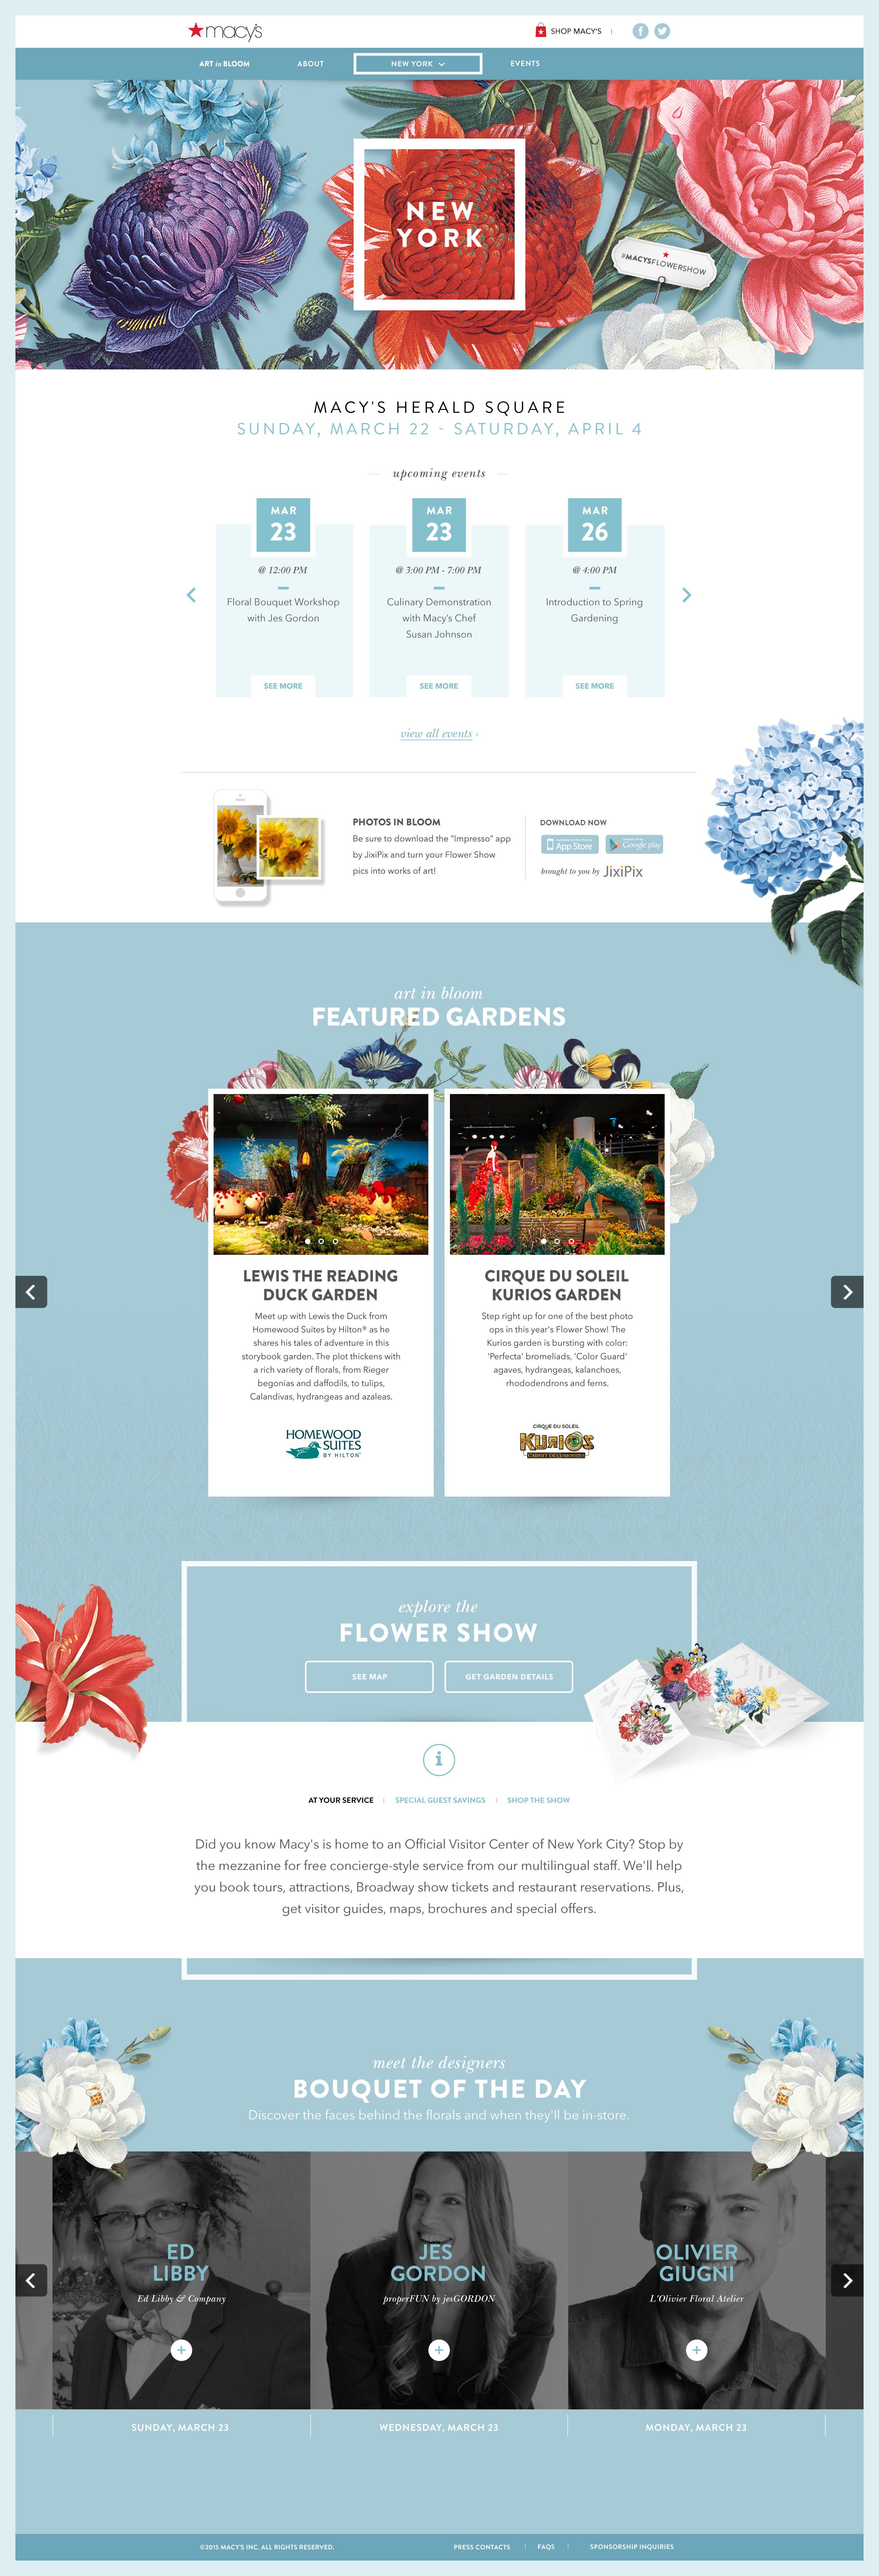 Work_FlowerShow_c.jpg